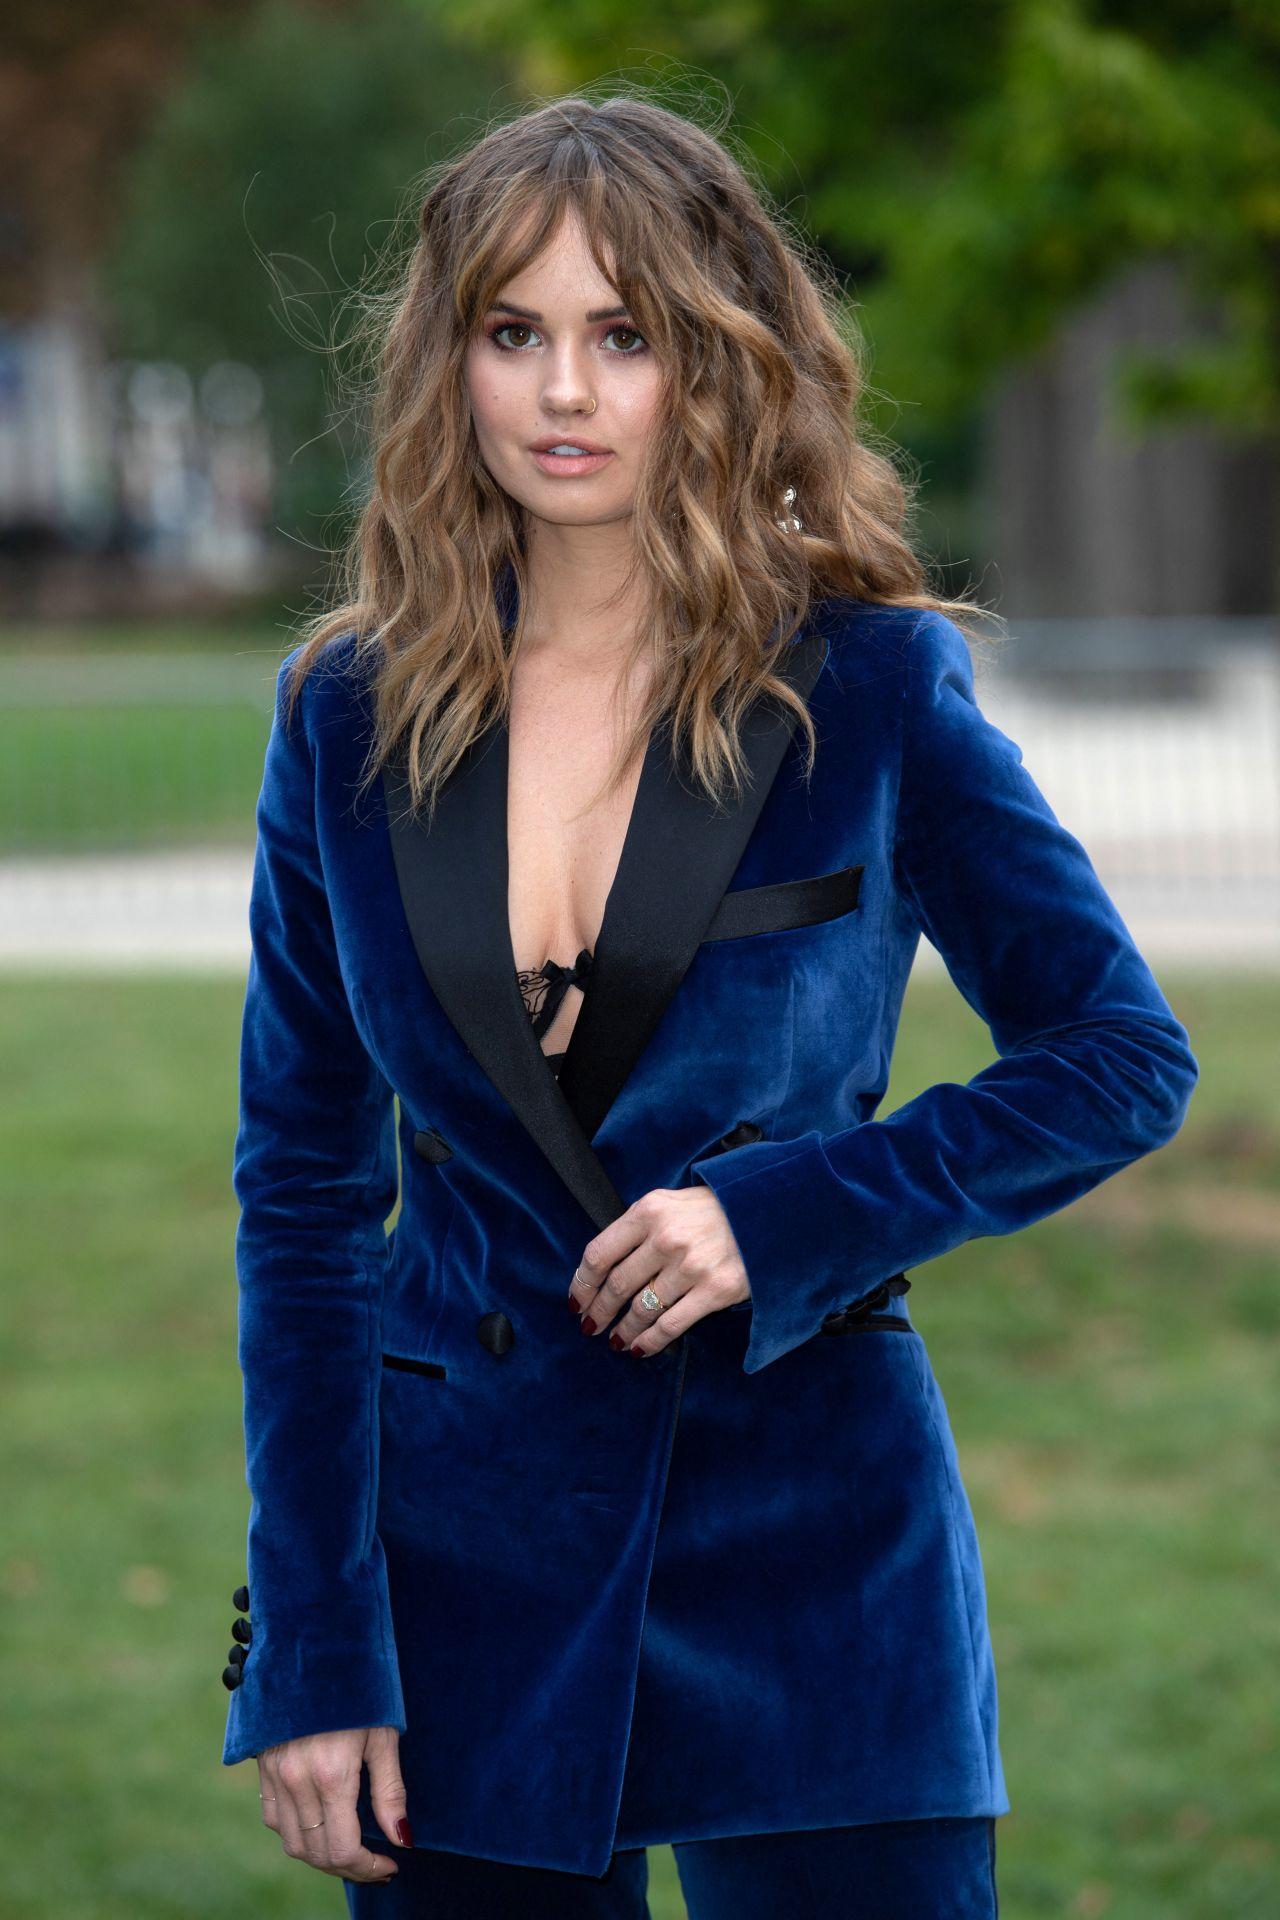 Debby Ryan - Elie Saab Fashion Show in Paris 09/28/2019